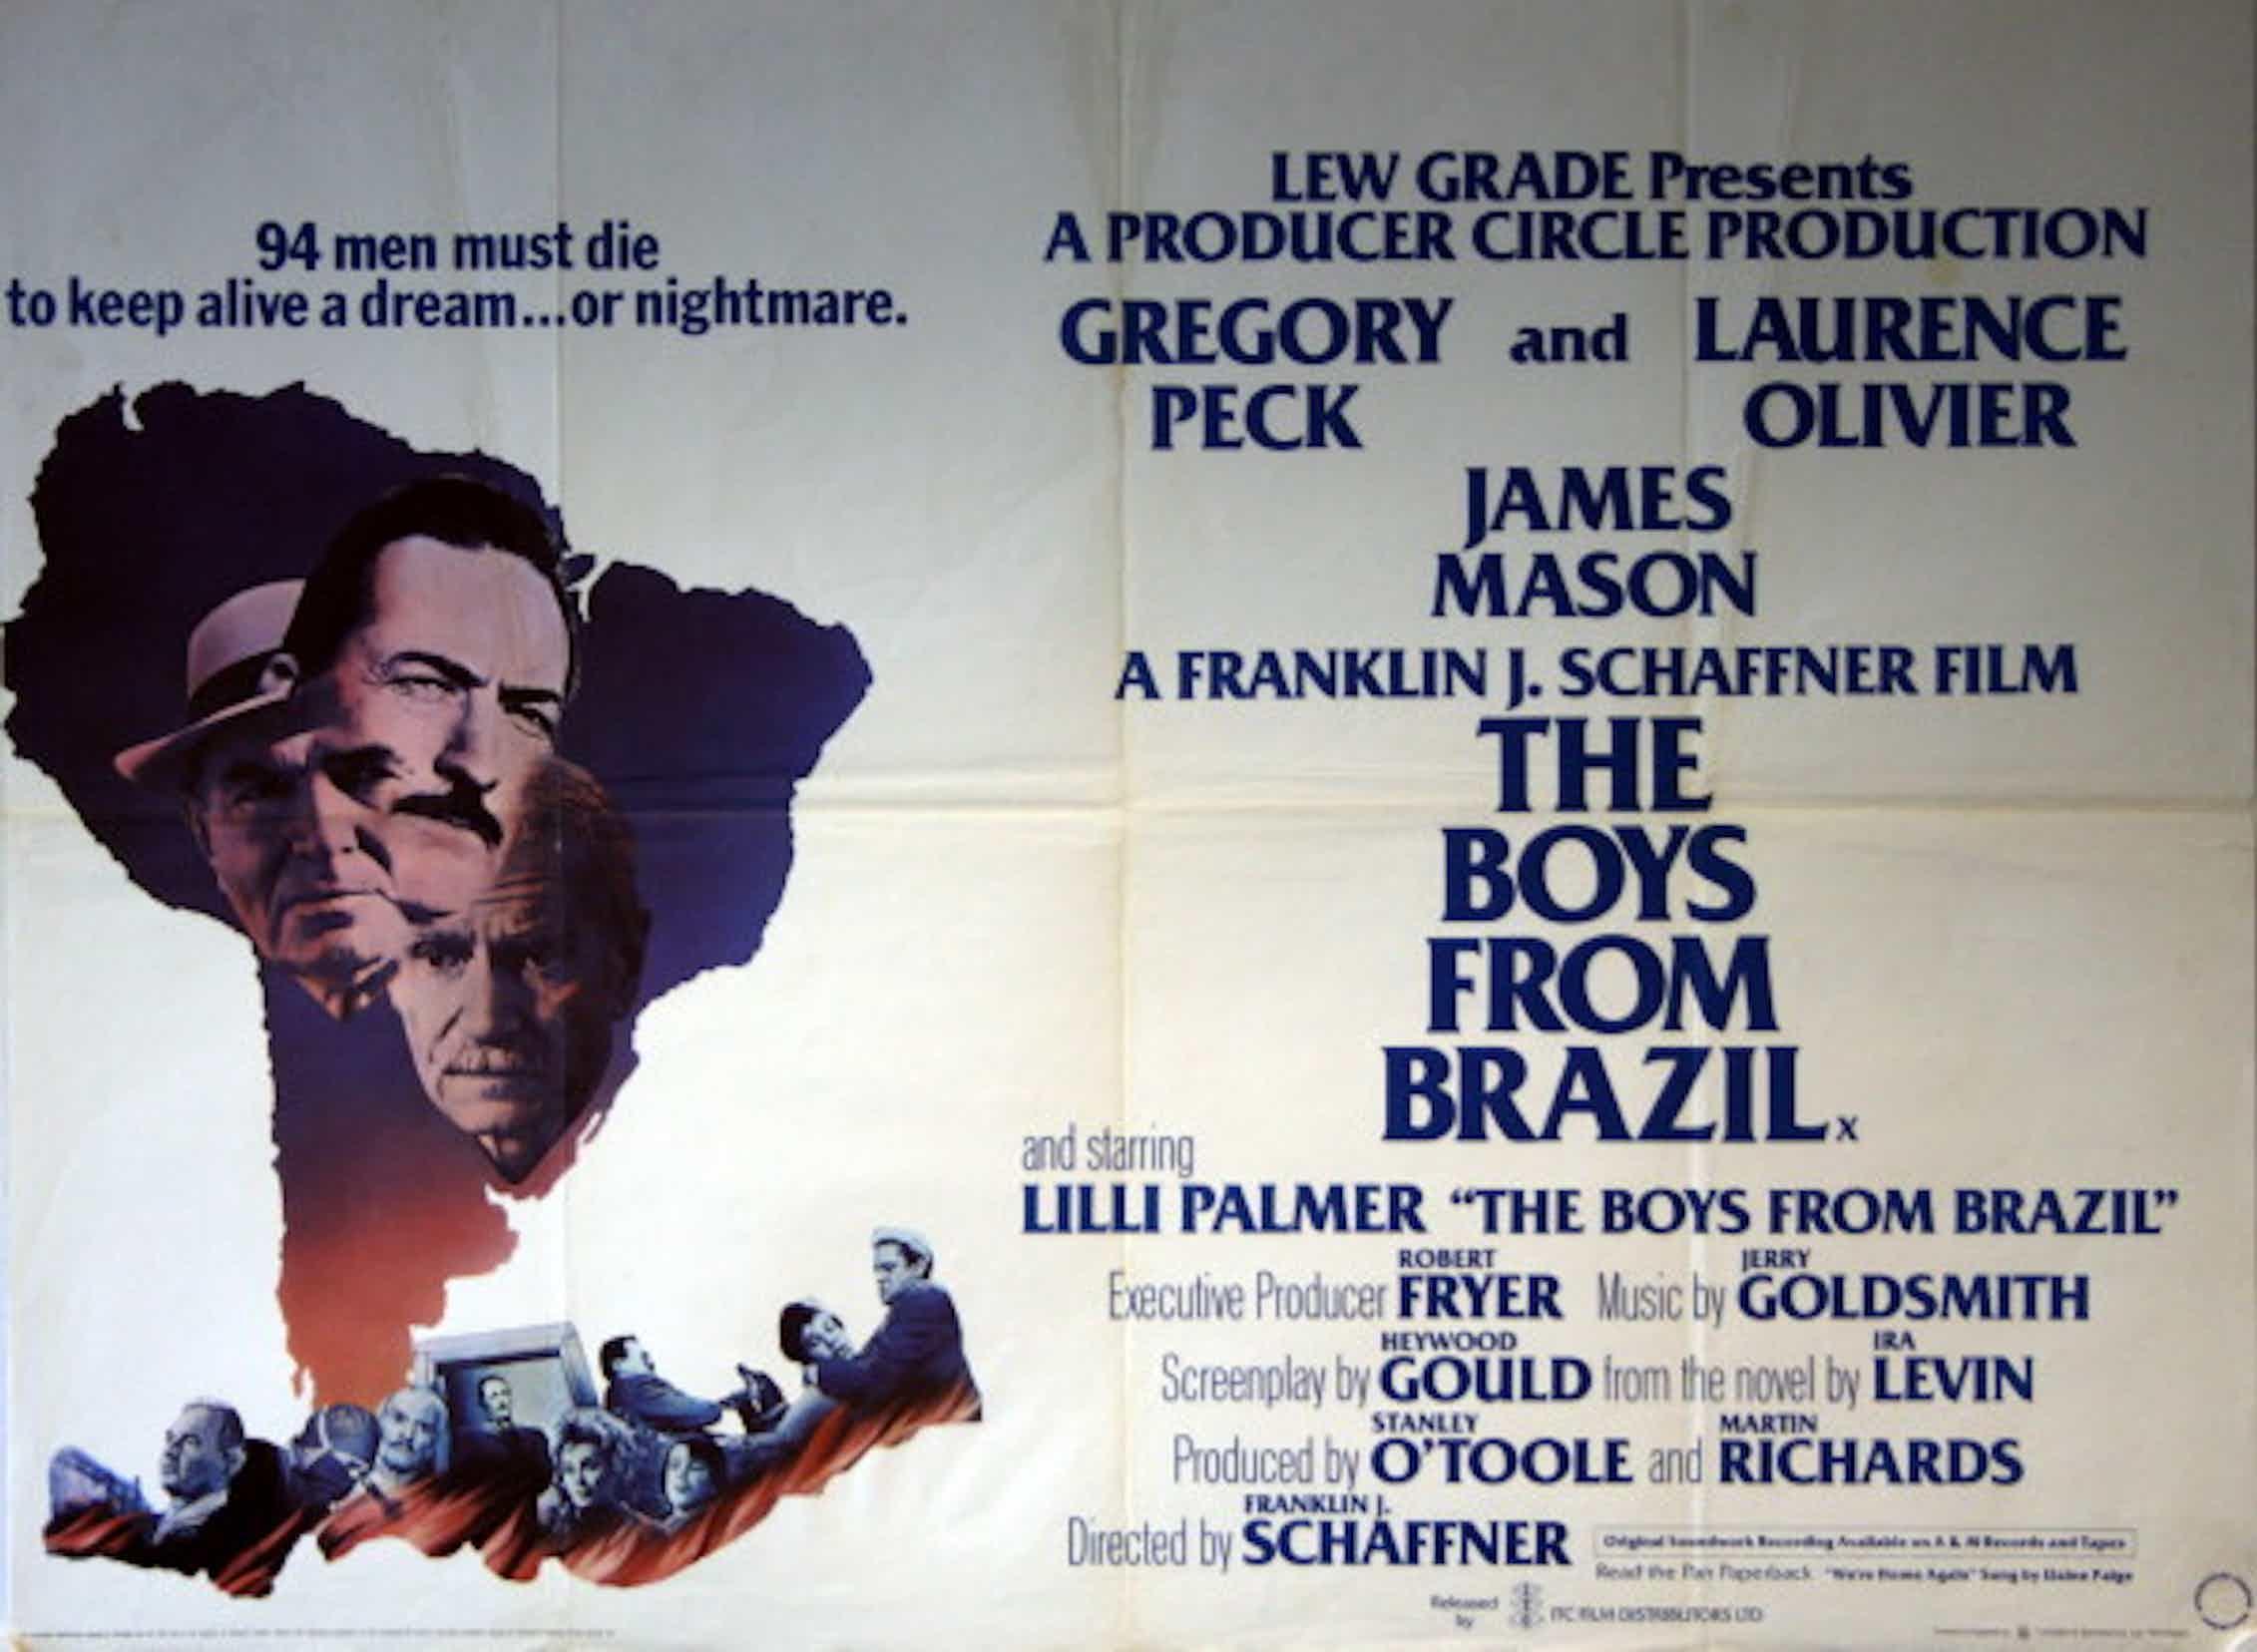 Cartel de la películaThe boys from Brazil(Los niños de Brasil), Franklin J. Schaffner, 1978.